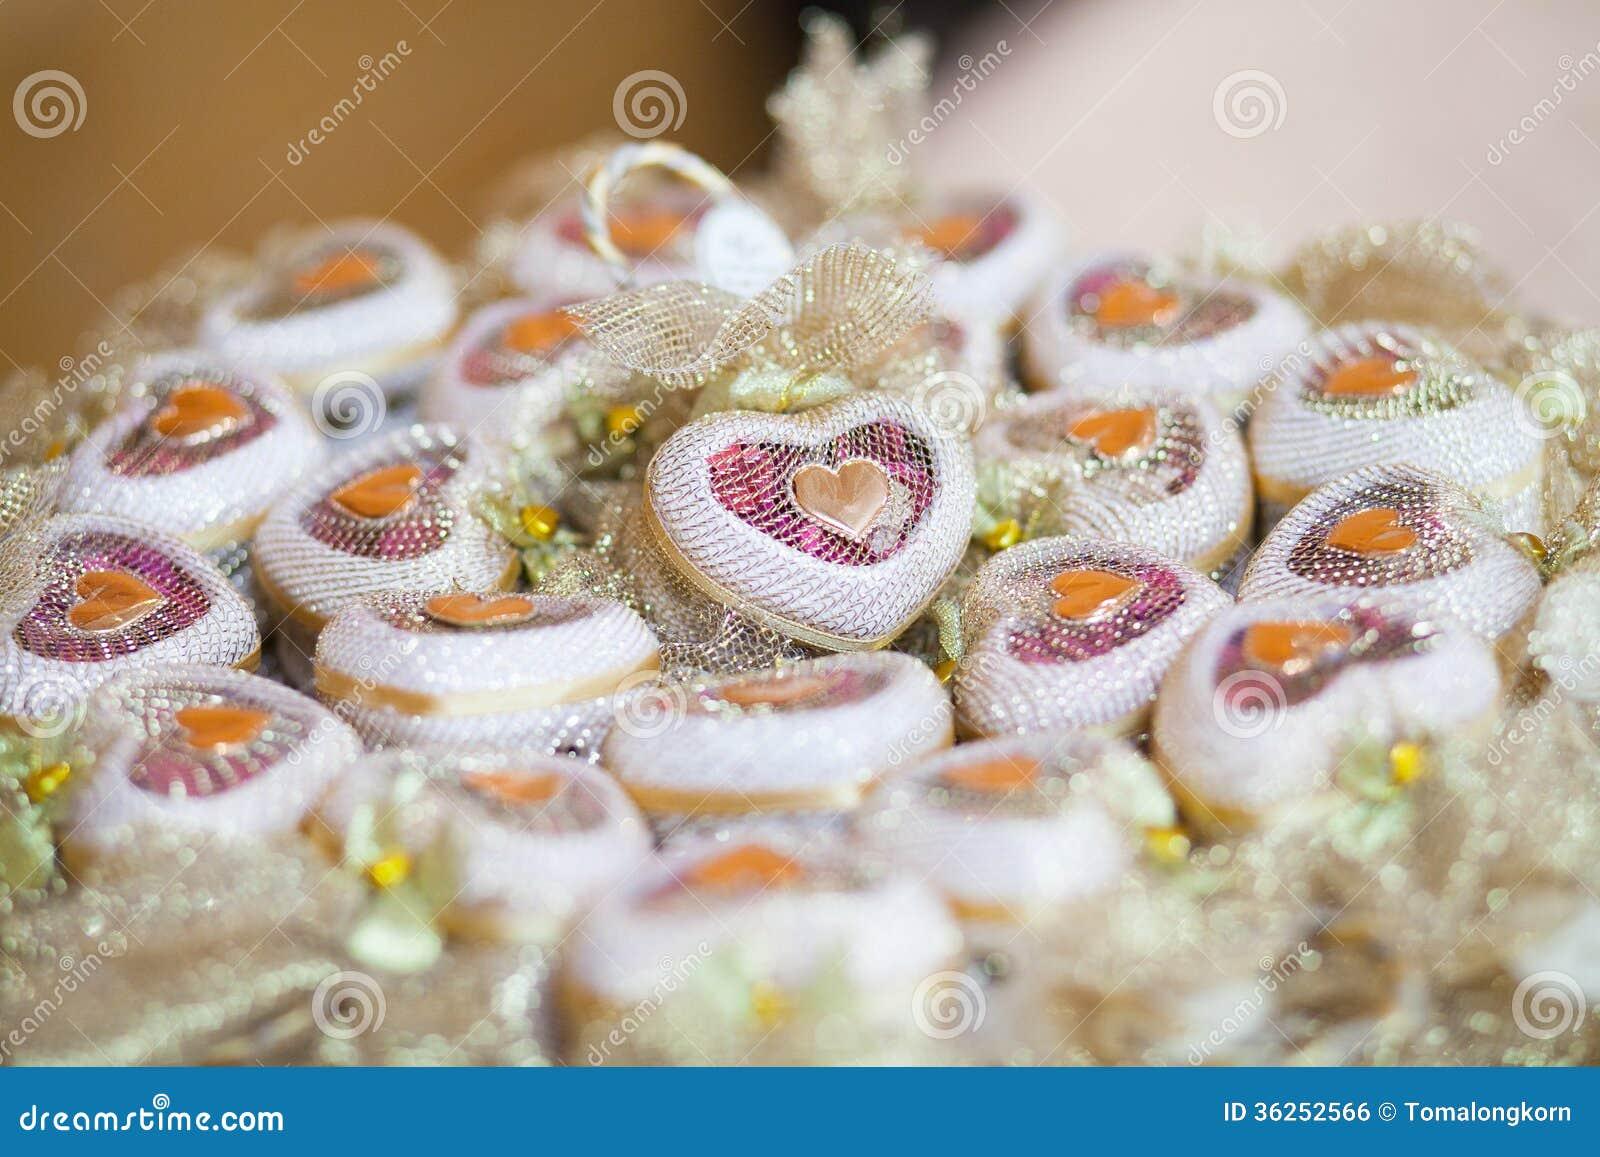 Heart wedding gift & Heart wedding gift stock photo. Image of background closeup - 36252566